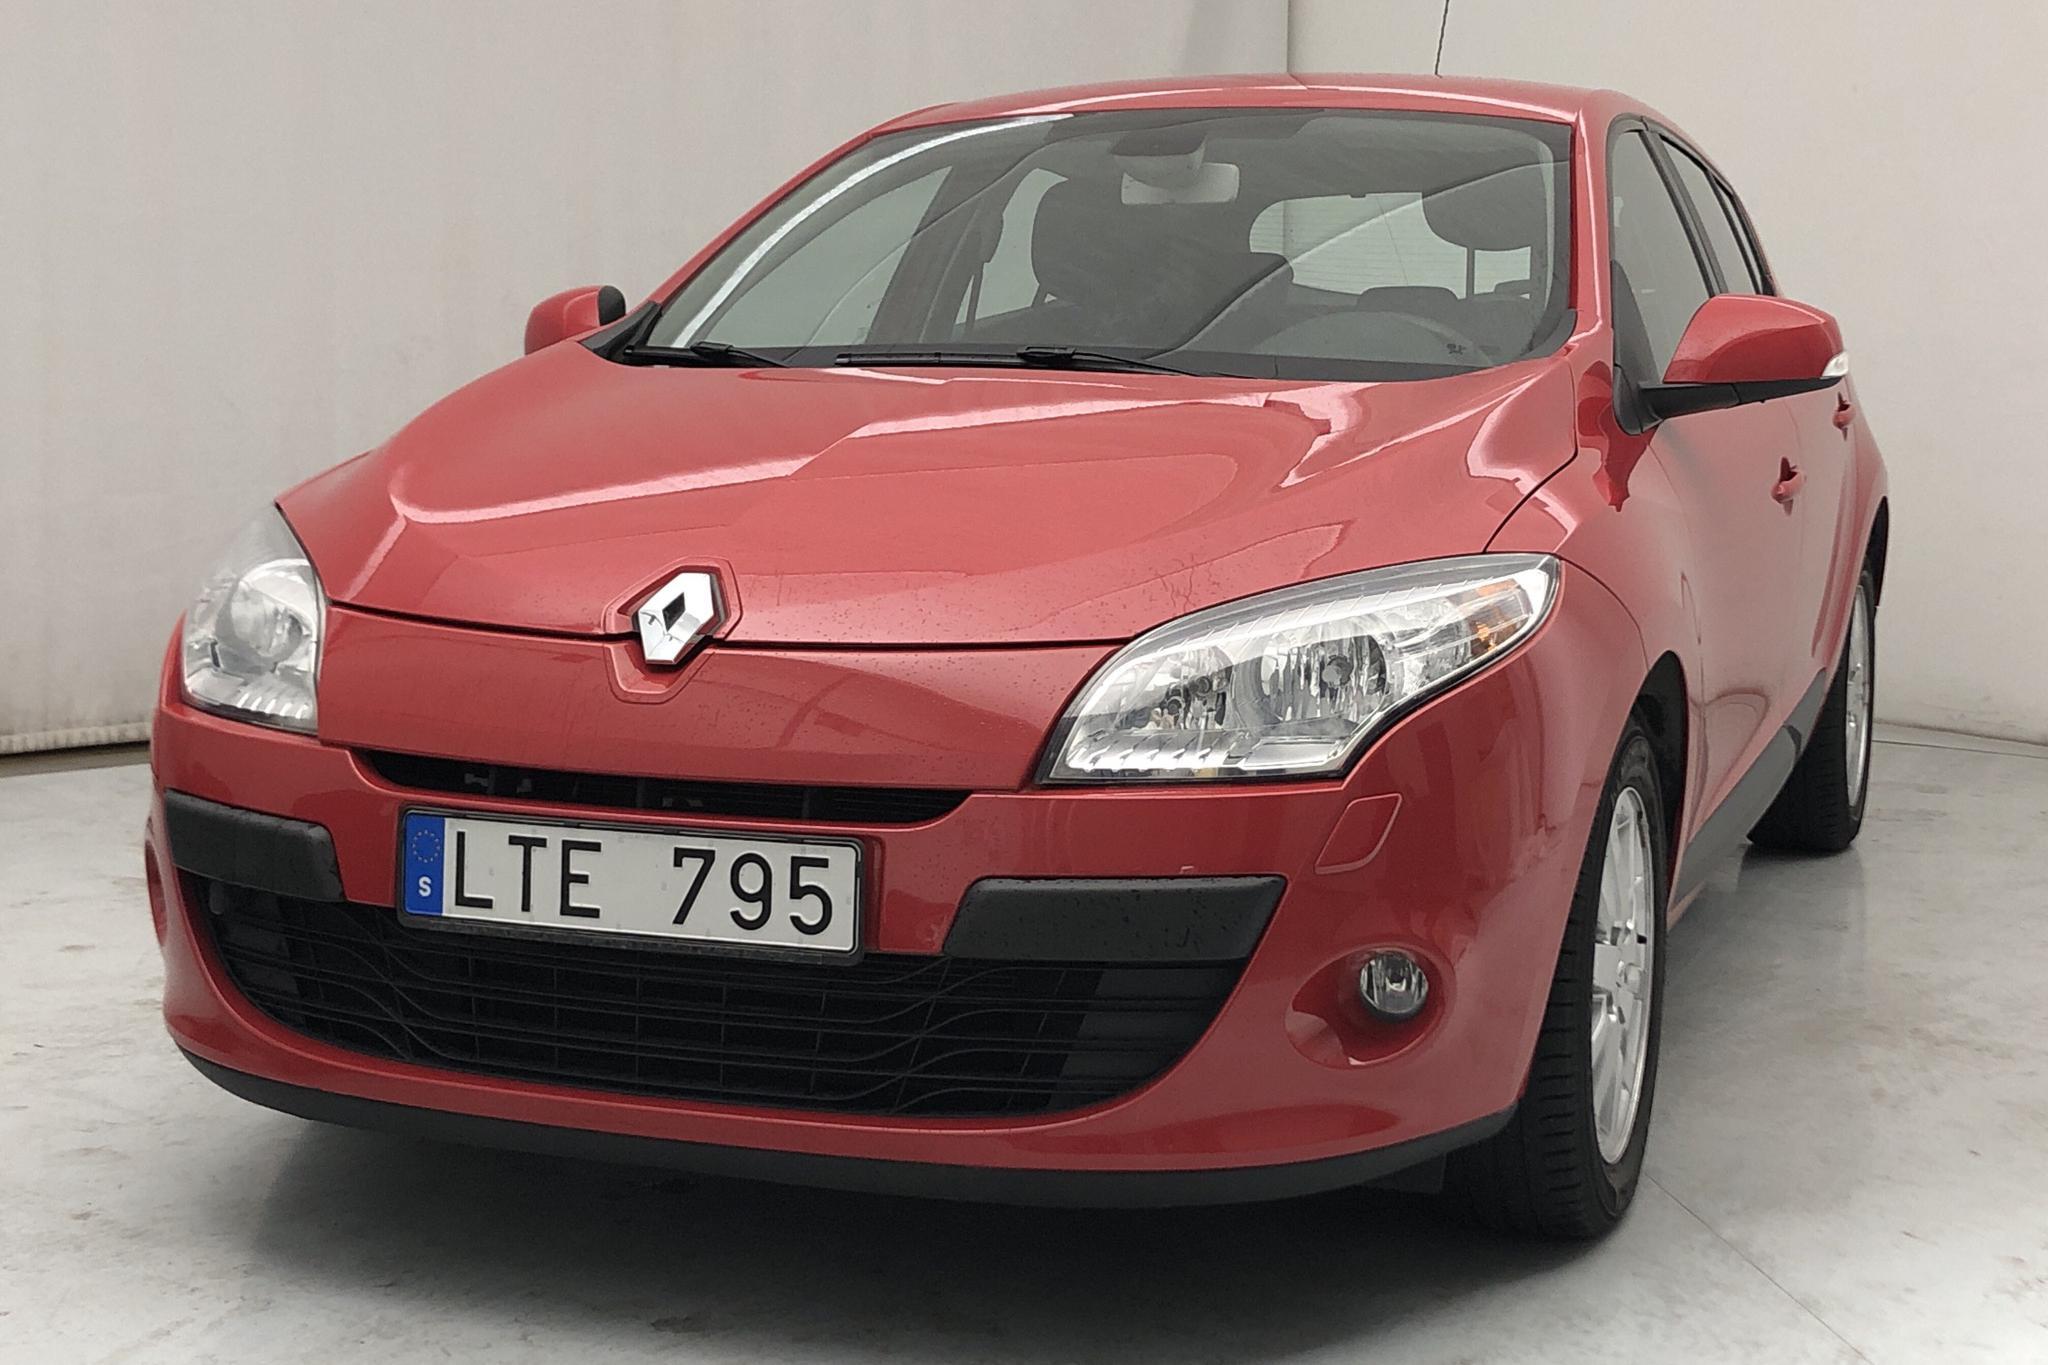 Renault Mégane Phas III 1.6 Eco2 Flex Fuel E85 5dr (110hk) - 6 888 mil - Manuell - röd - 2011